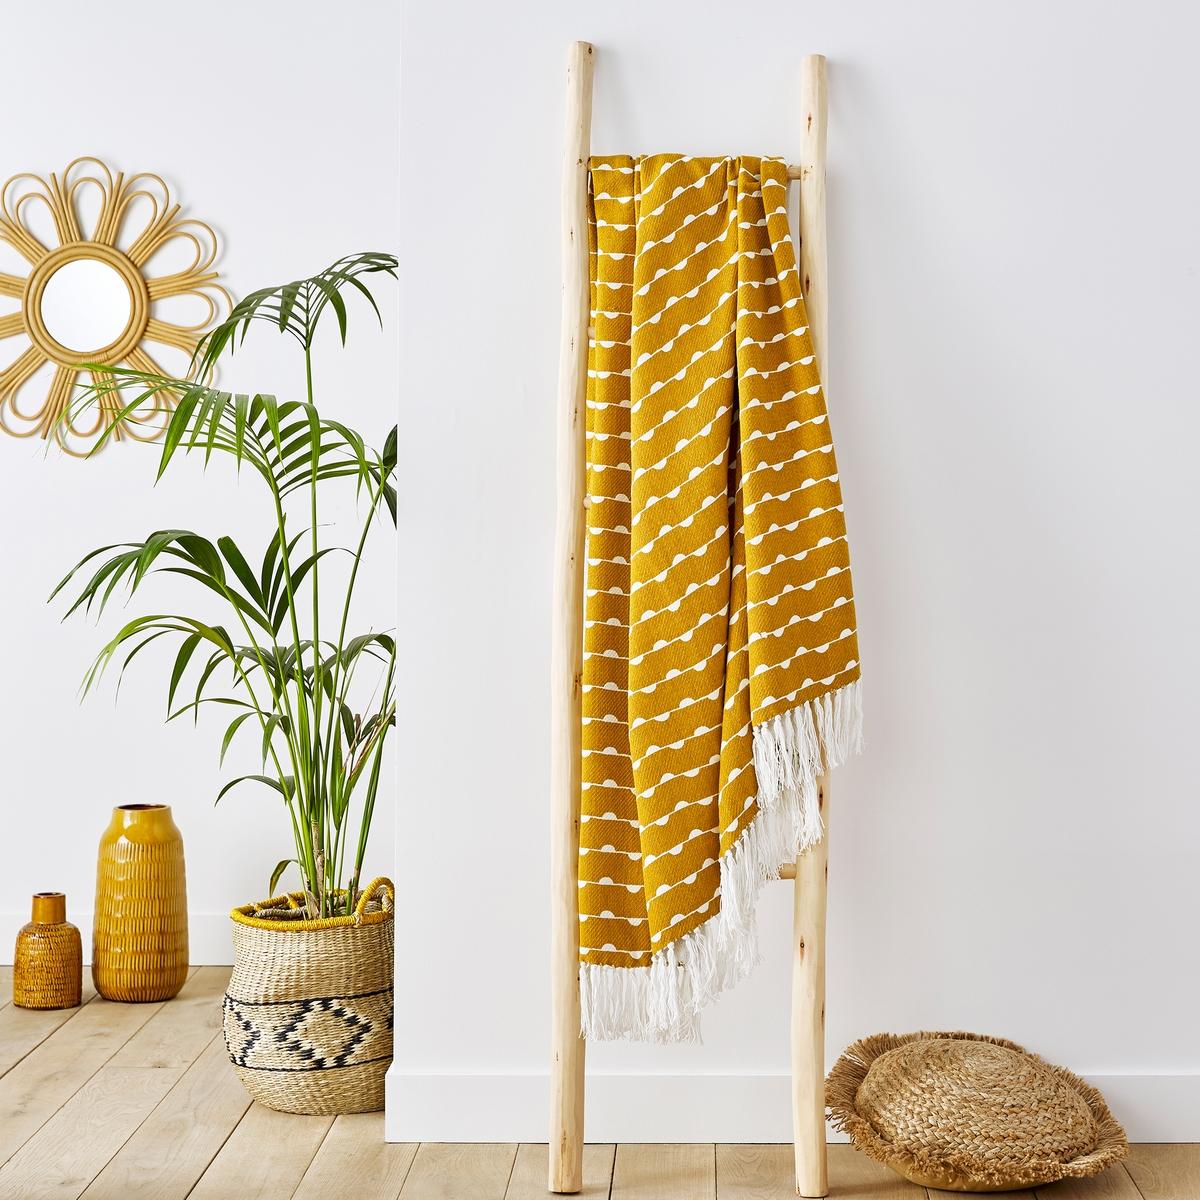 Фото - Плед LaRedoute С принтом Irun единый размер желтый скатерть laredoute с принтом и пропиткой 100 хлопок irun 150 x 250 см желтый